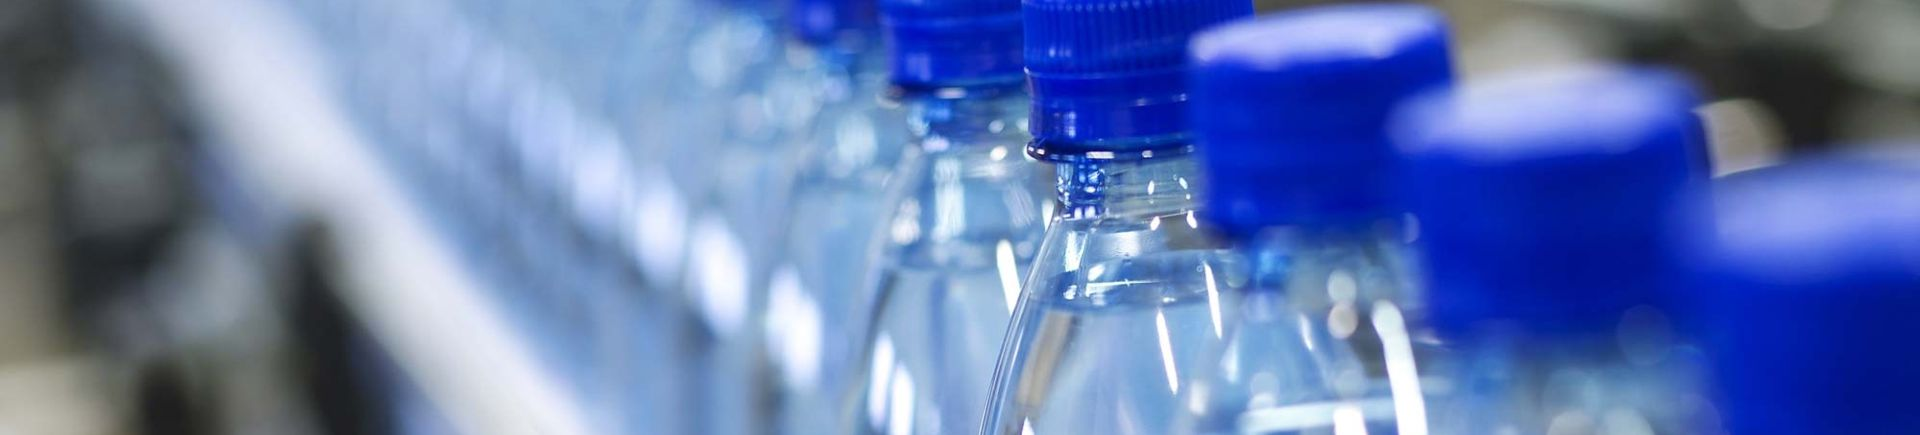 glass-coated PET bottles